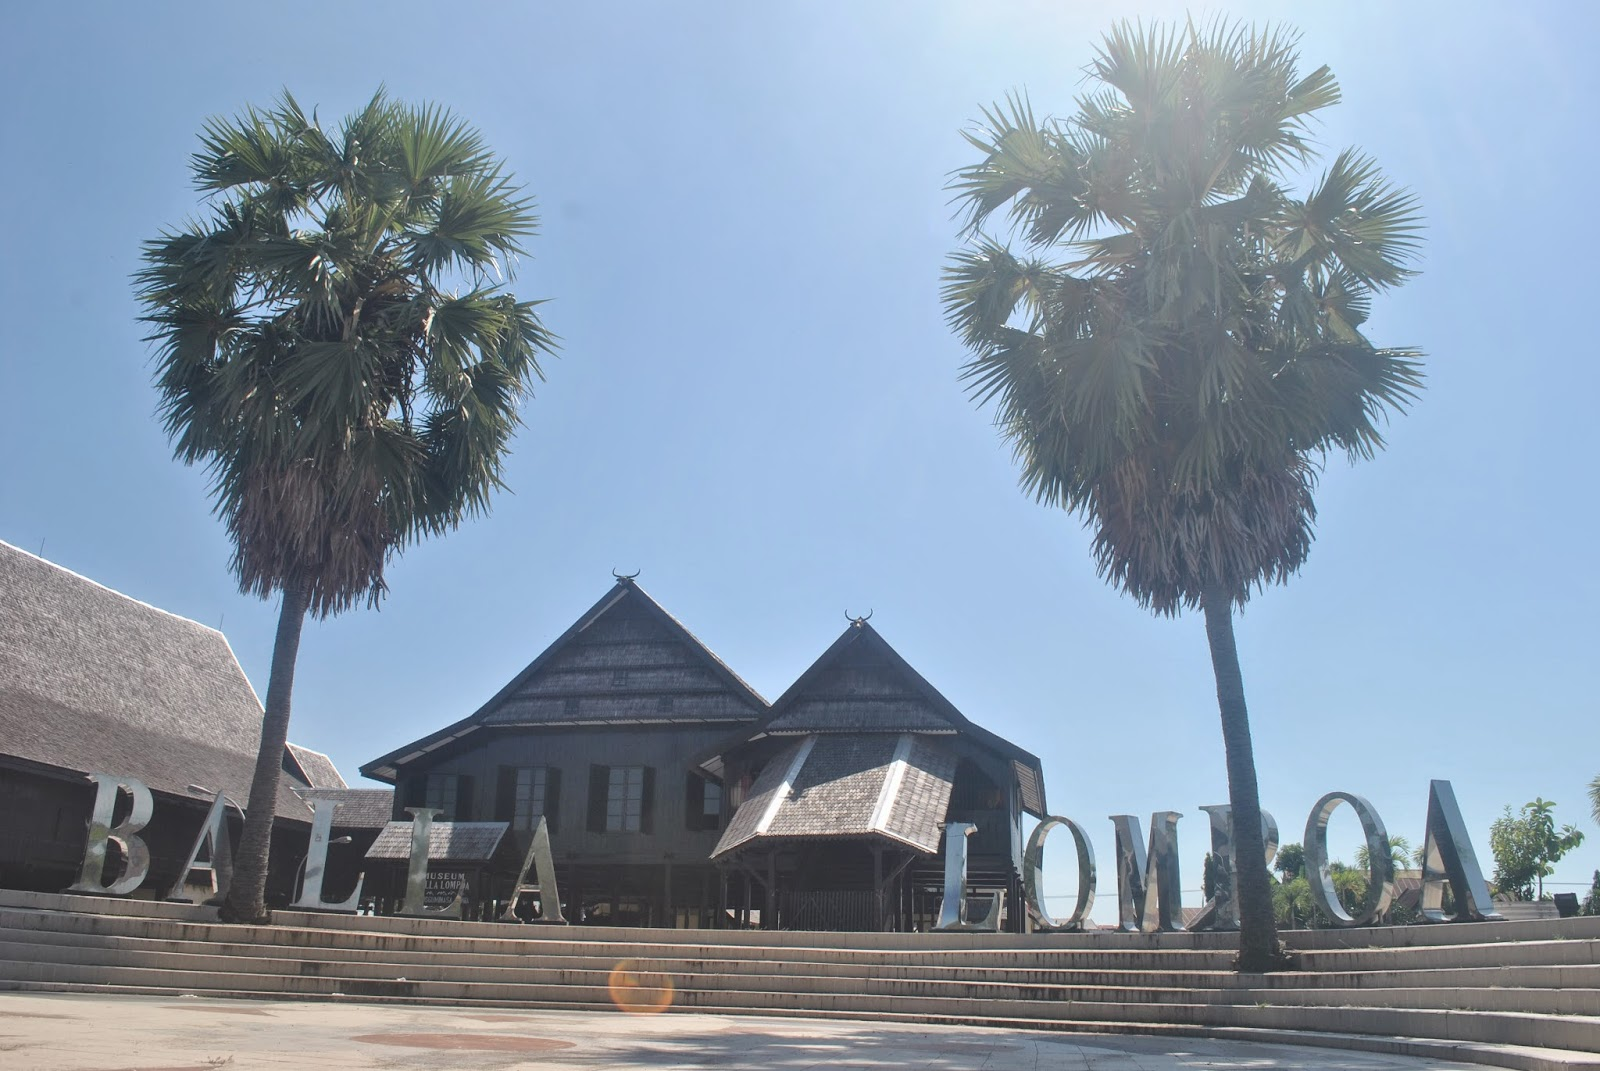 Taurungkana Butta Gowa Young Man Museum Balla Lompoa Kota Makassar